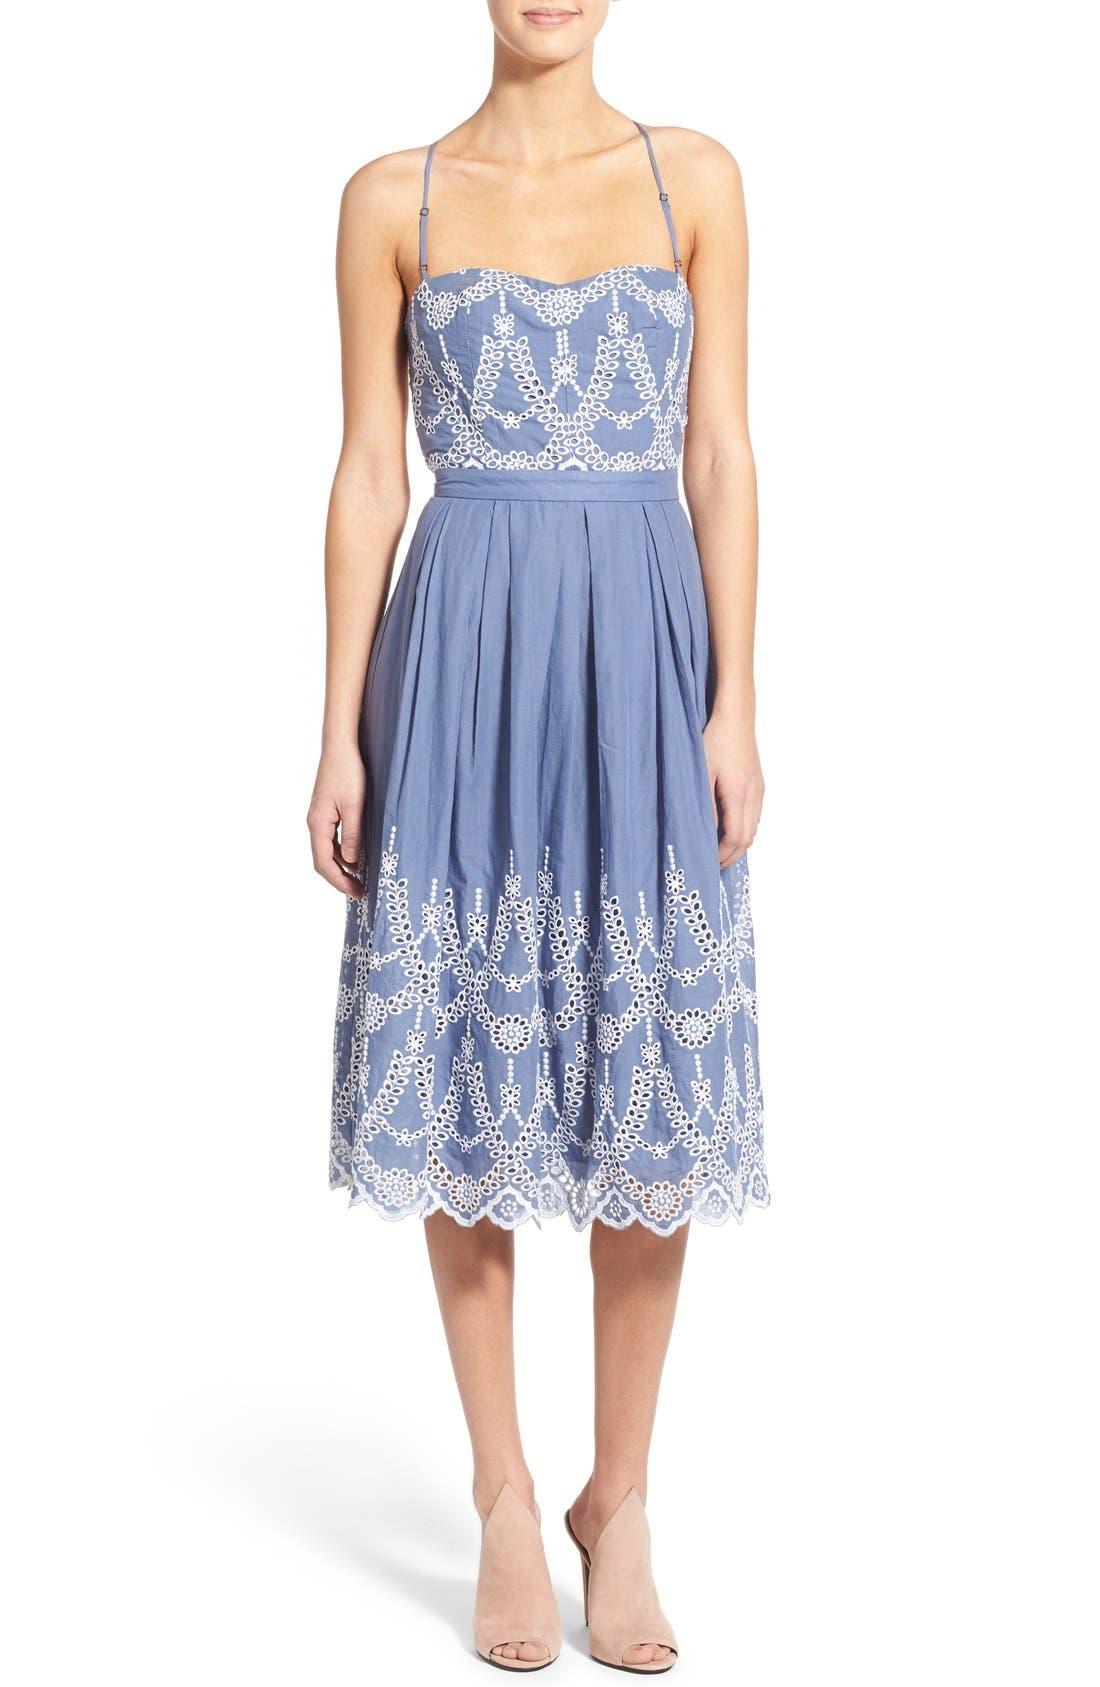 Main Image - KENDALL + KYLIE Cotton Eyelet Halter Dress